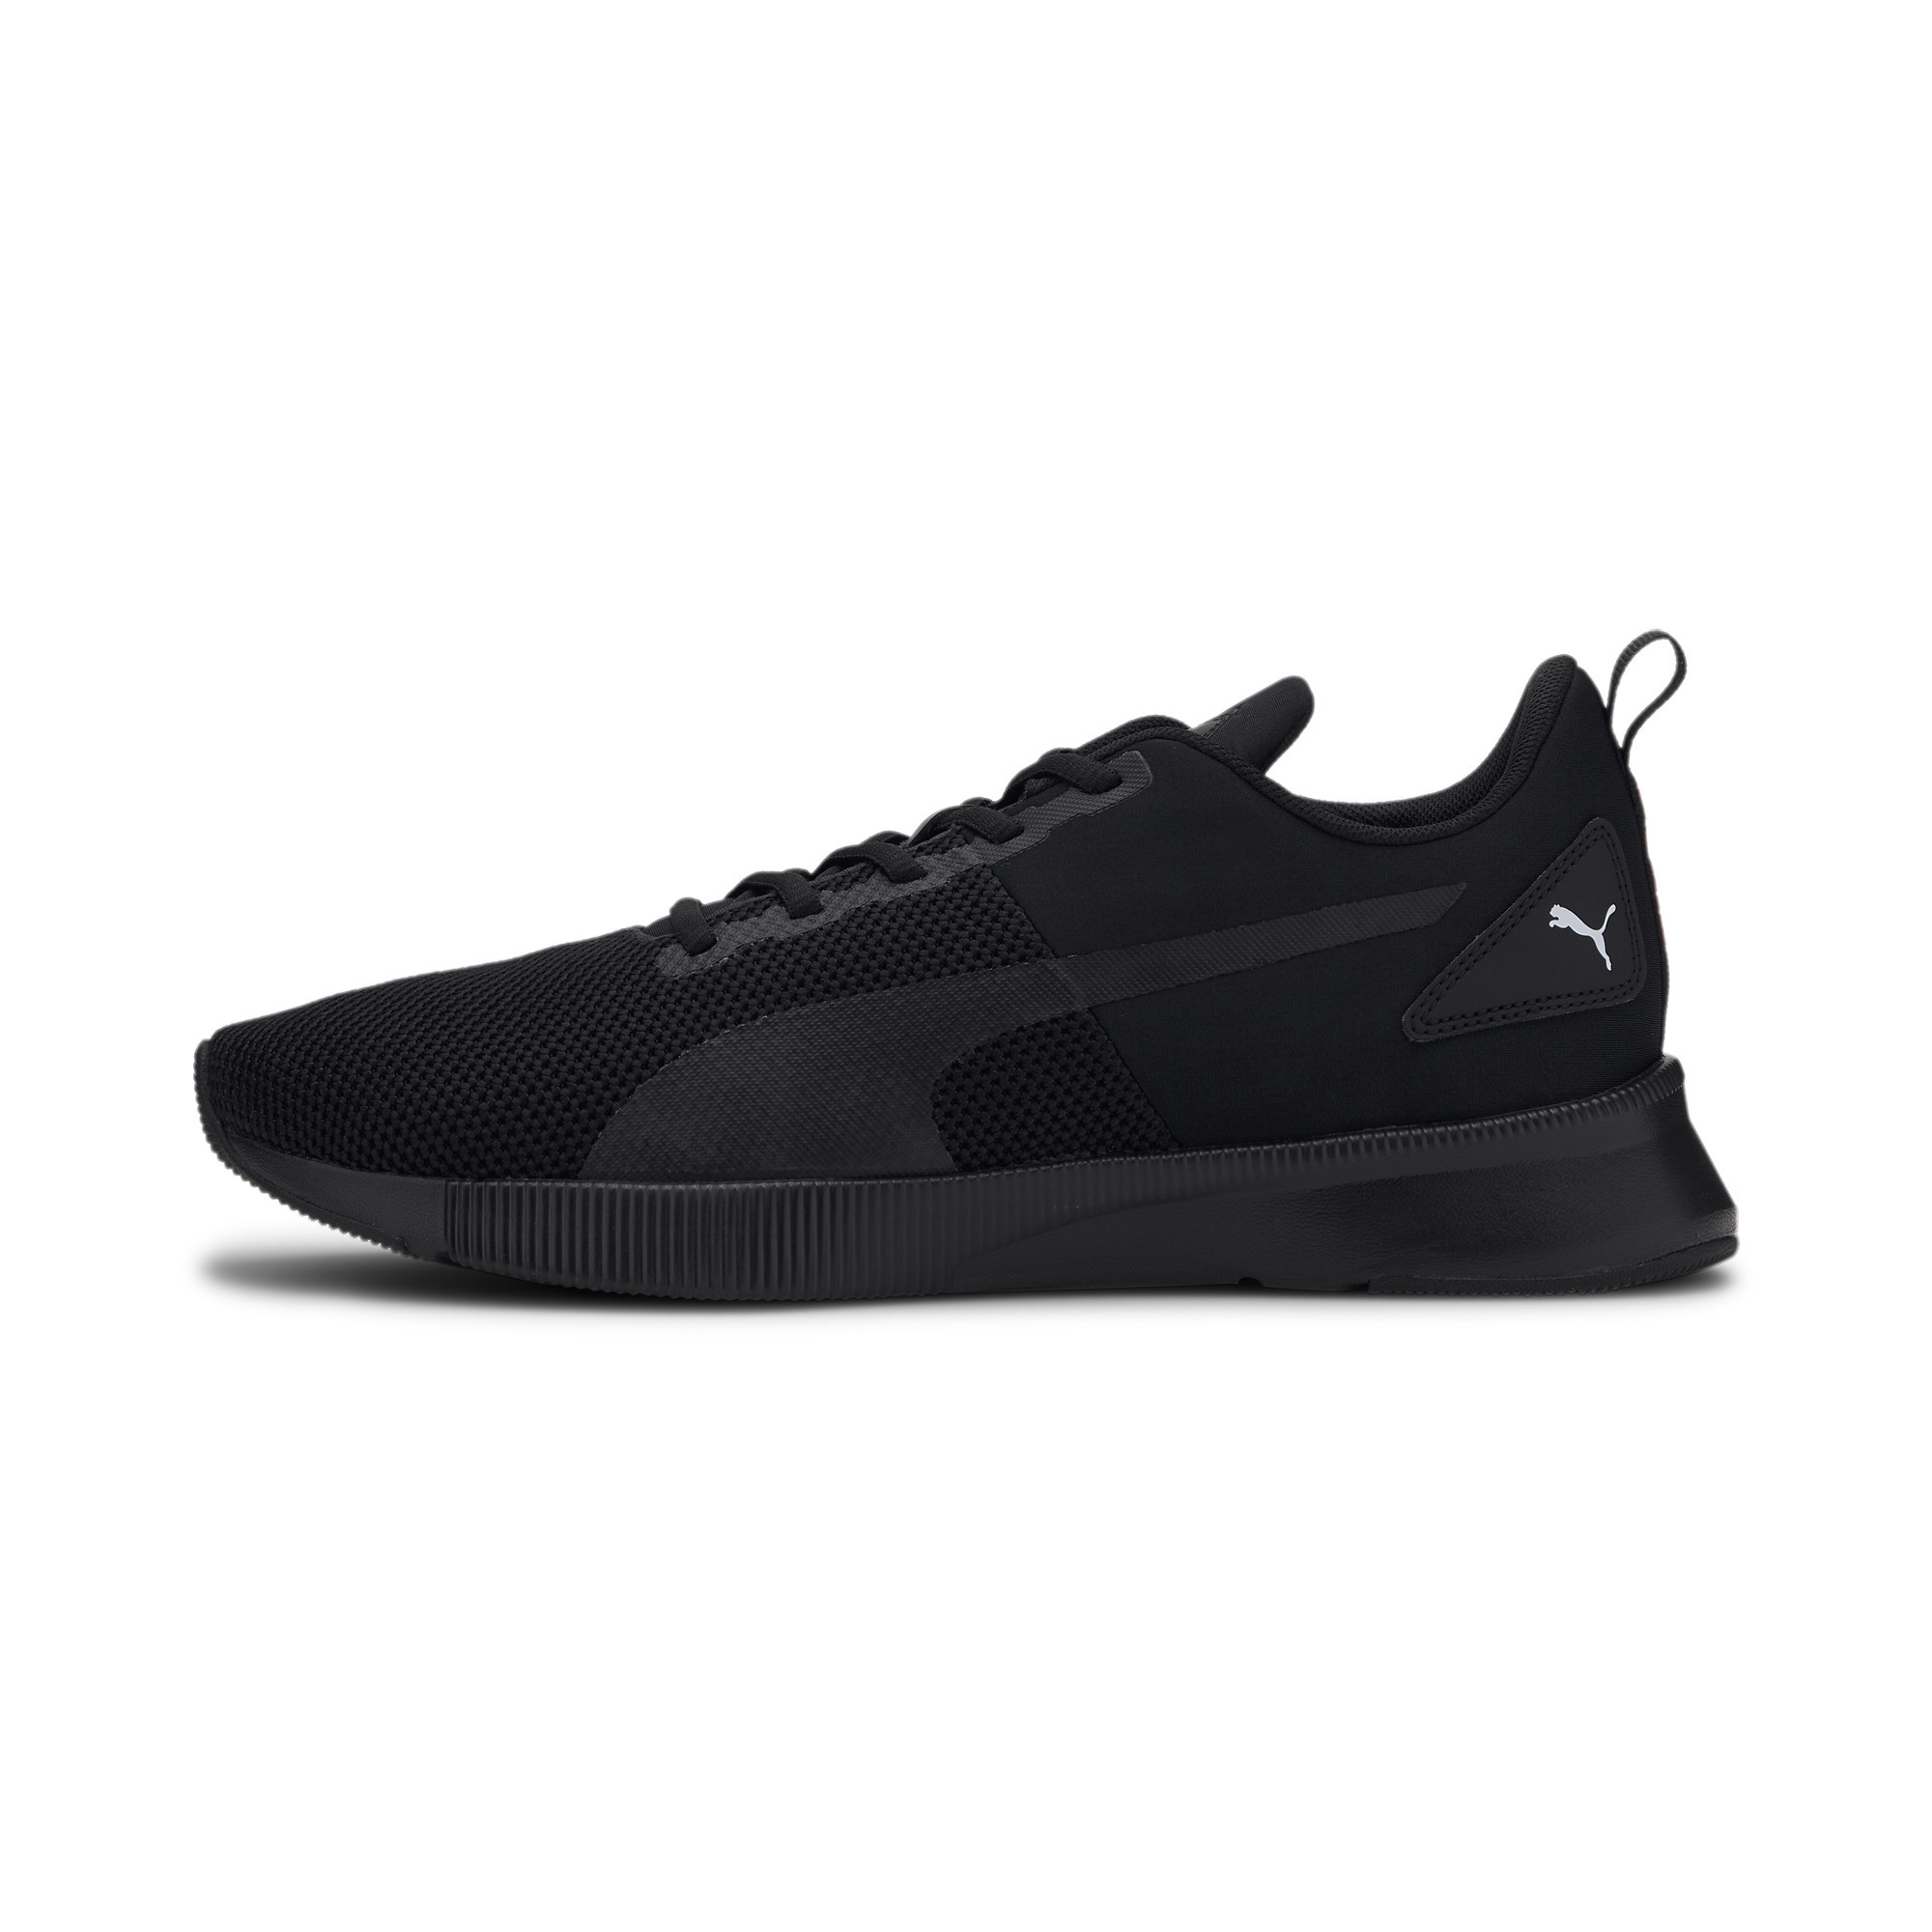 PUMA-Flyer-Runner-Running-Shoes-Mens-Shoe-Running thumbnail 28